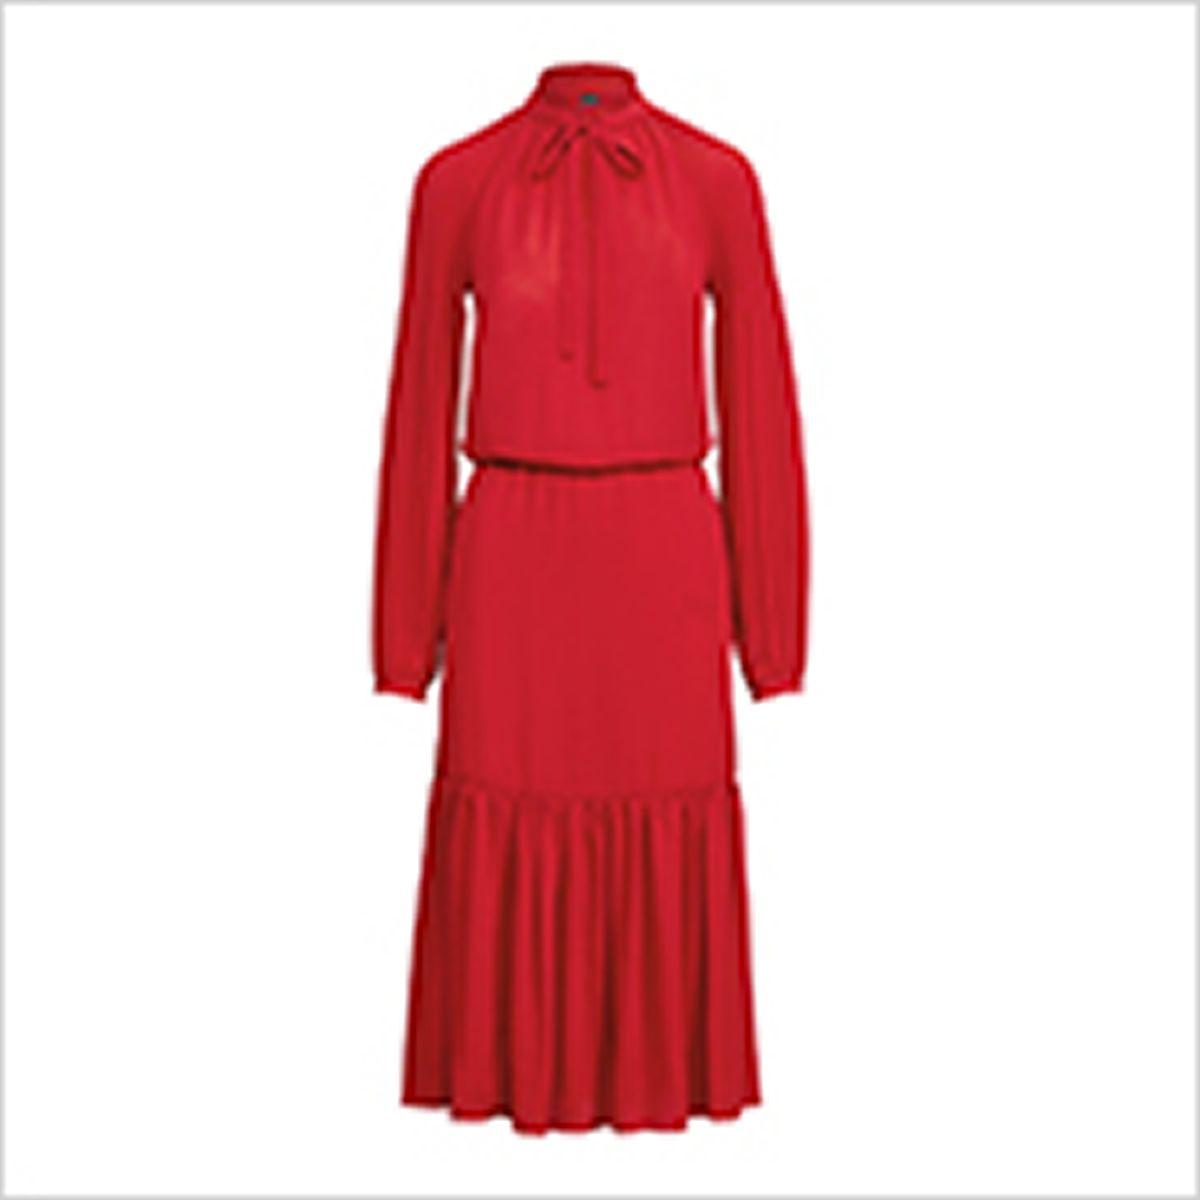 0ab91dd52079 Ralph Lauren Dresses - Macy's